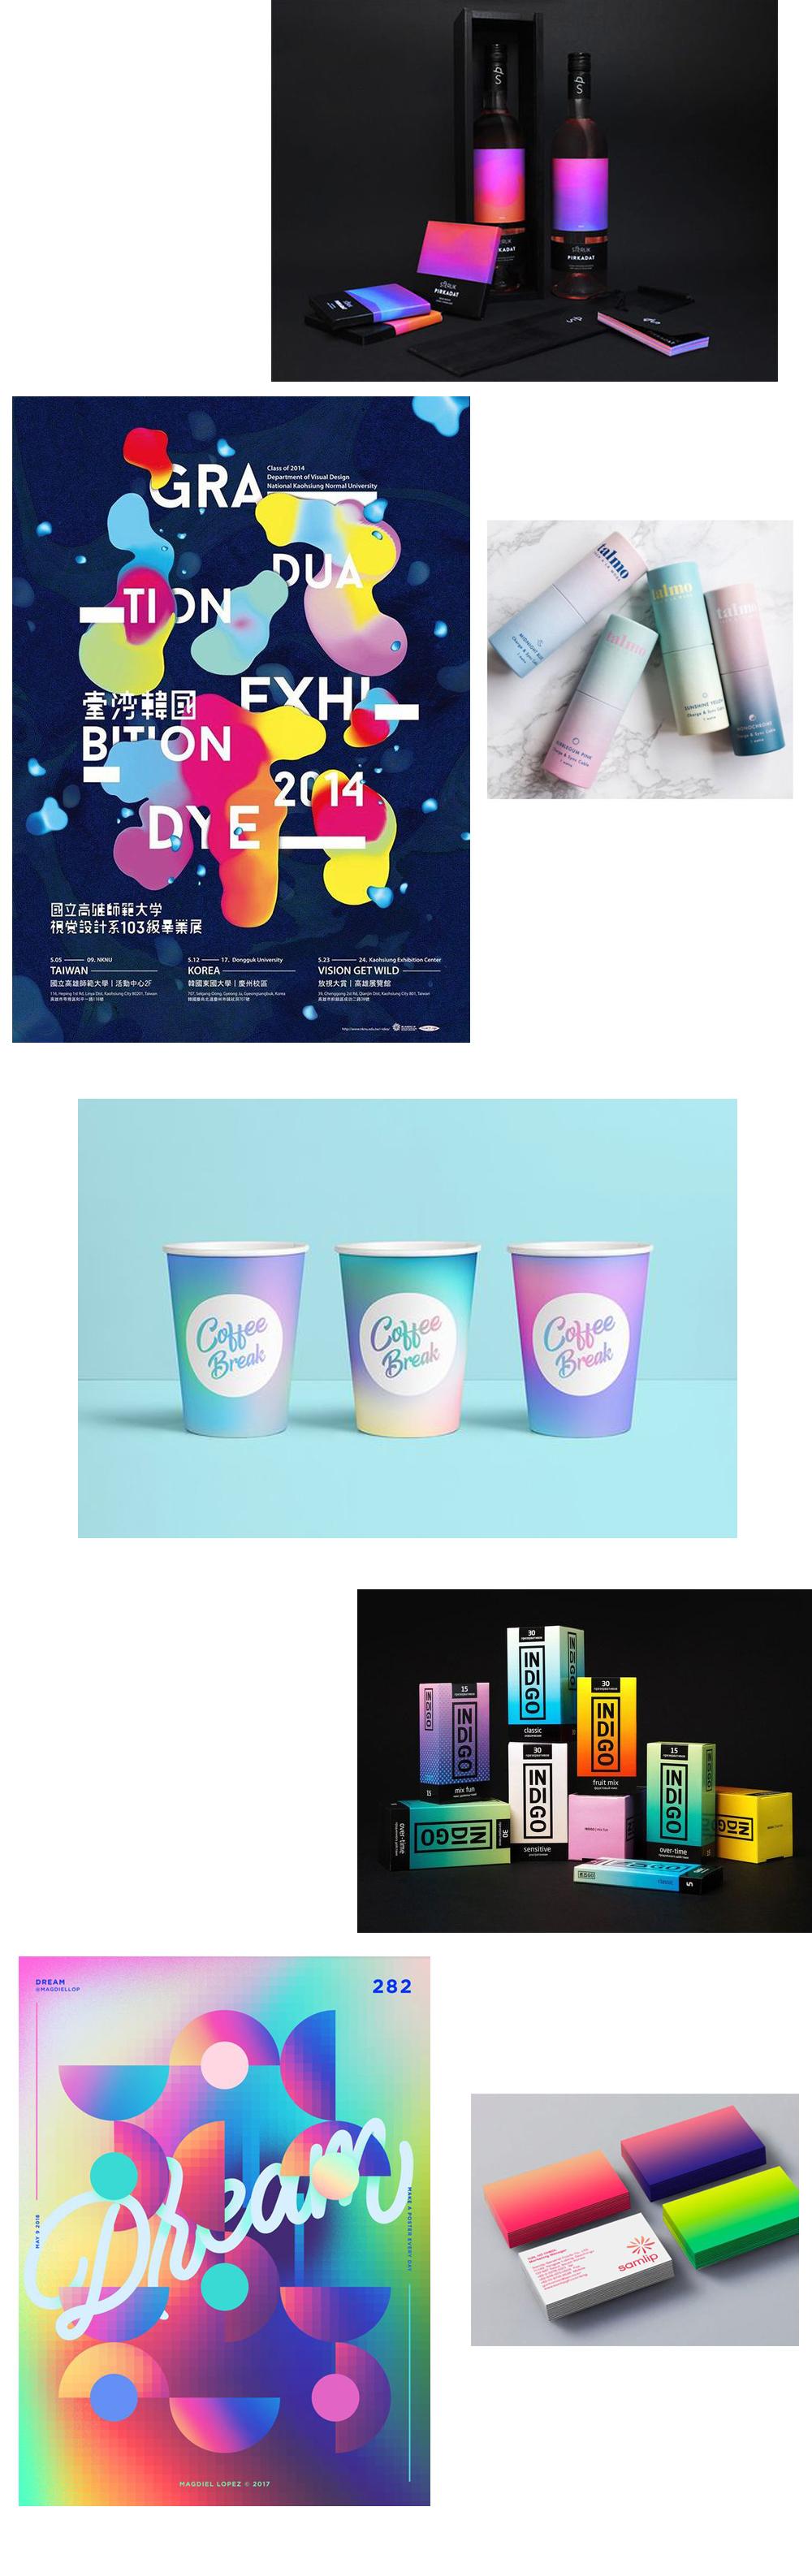 gradient trend in paper, branding and packaging